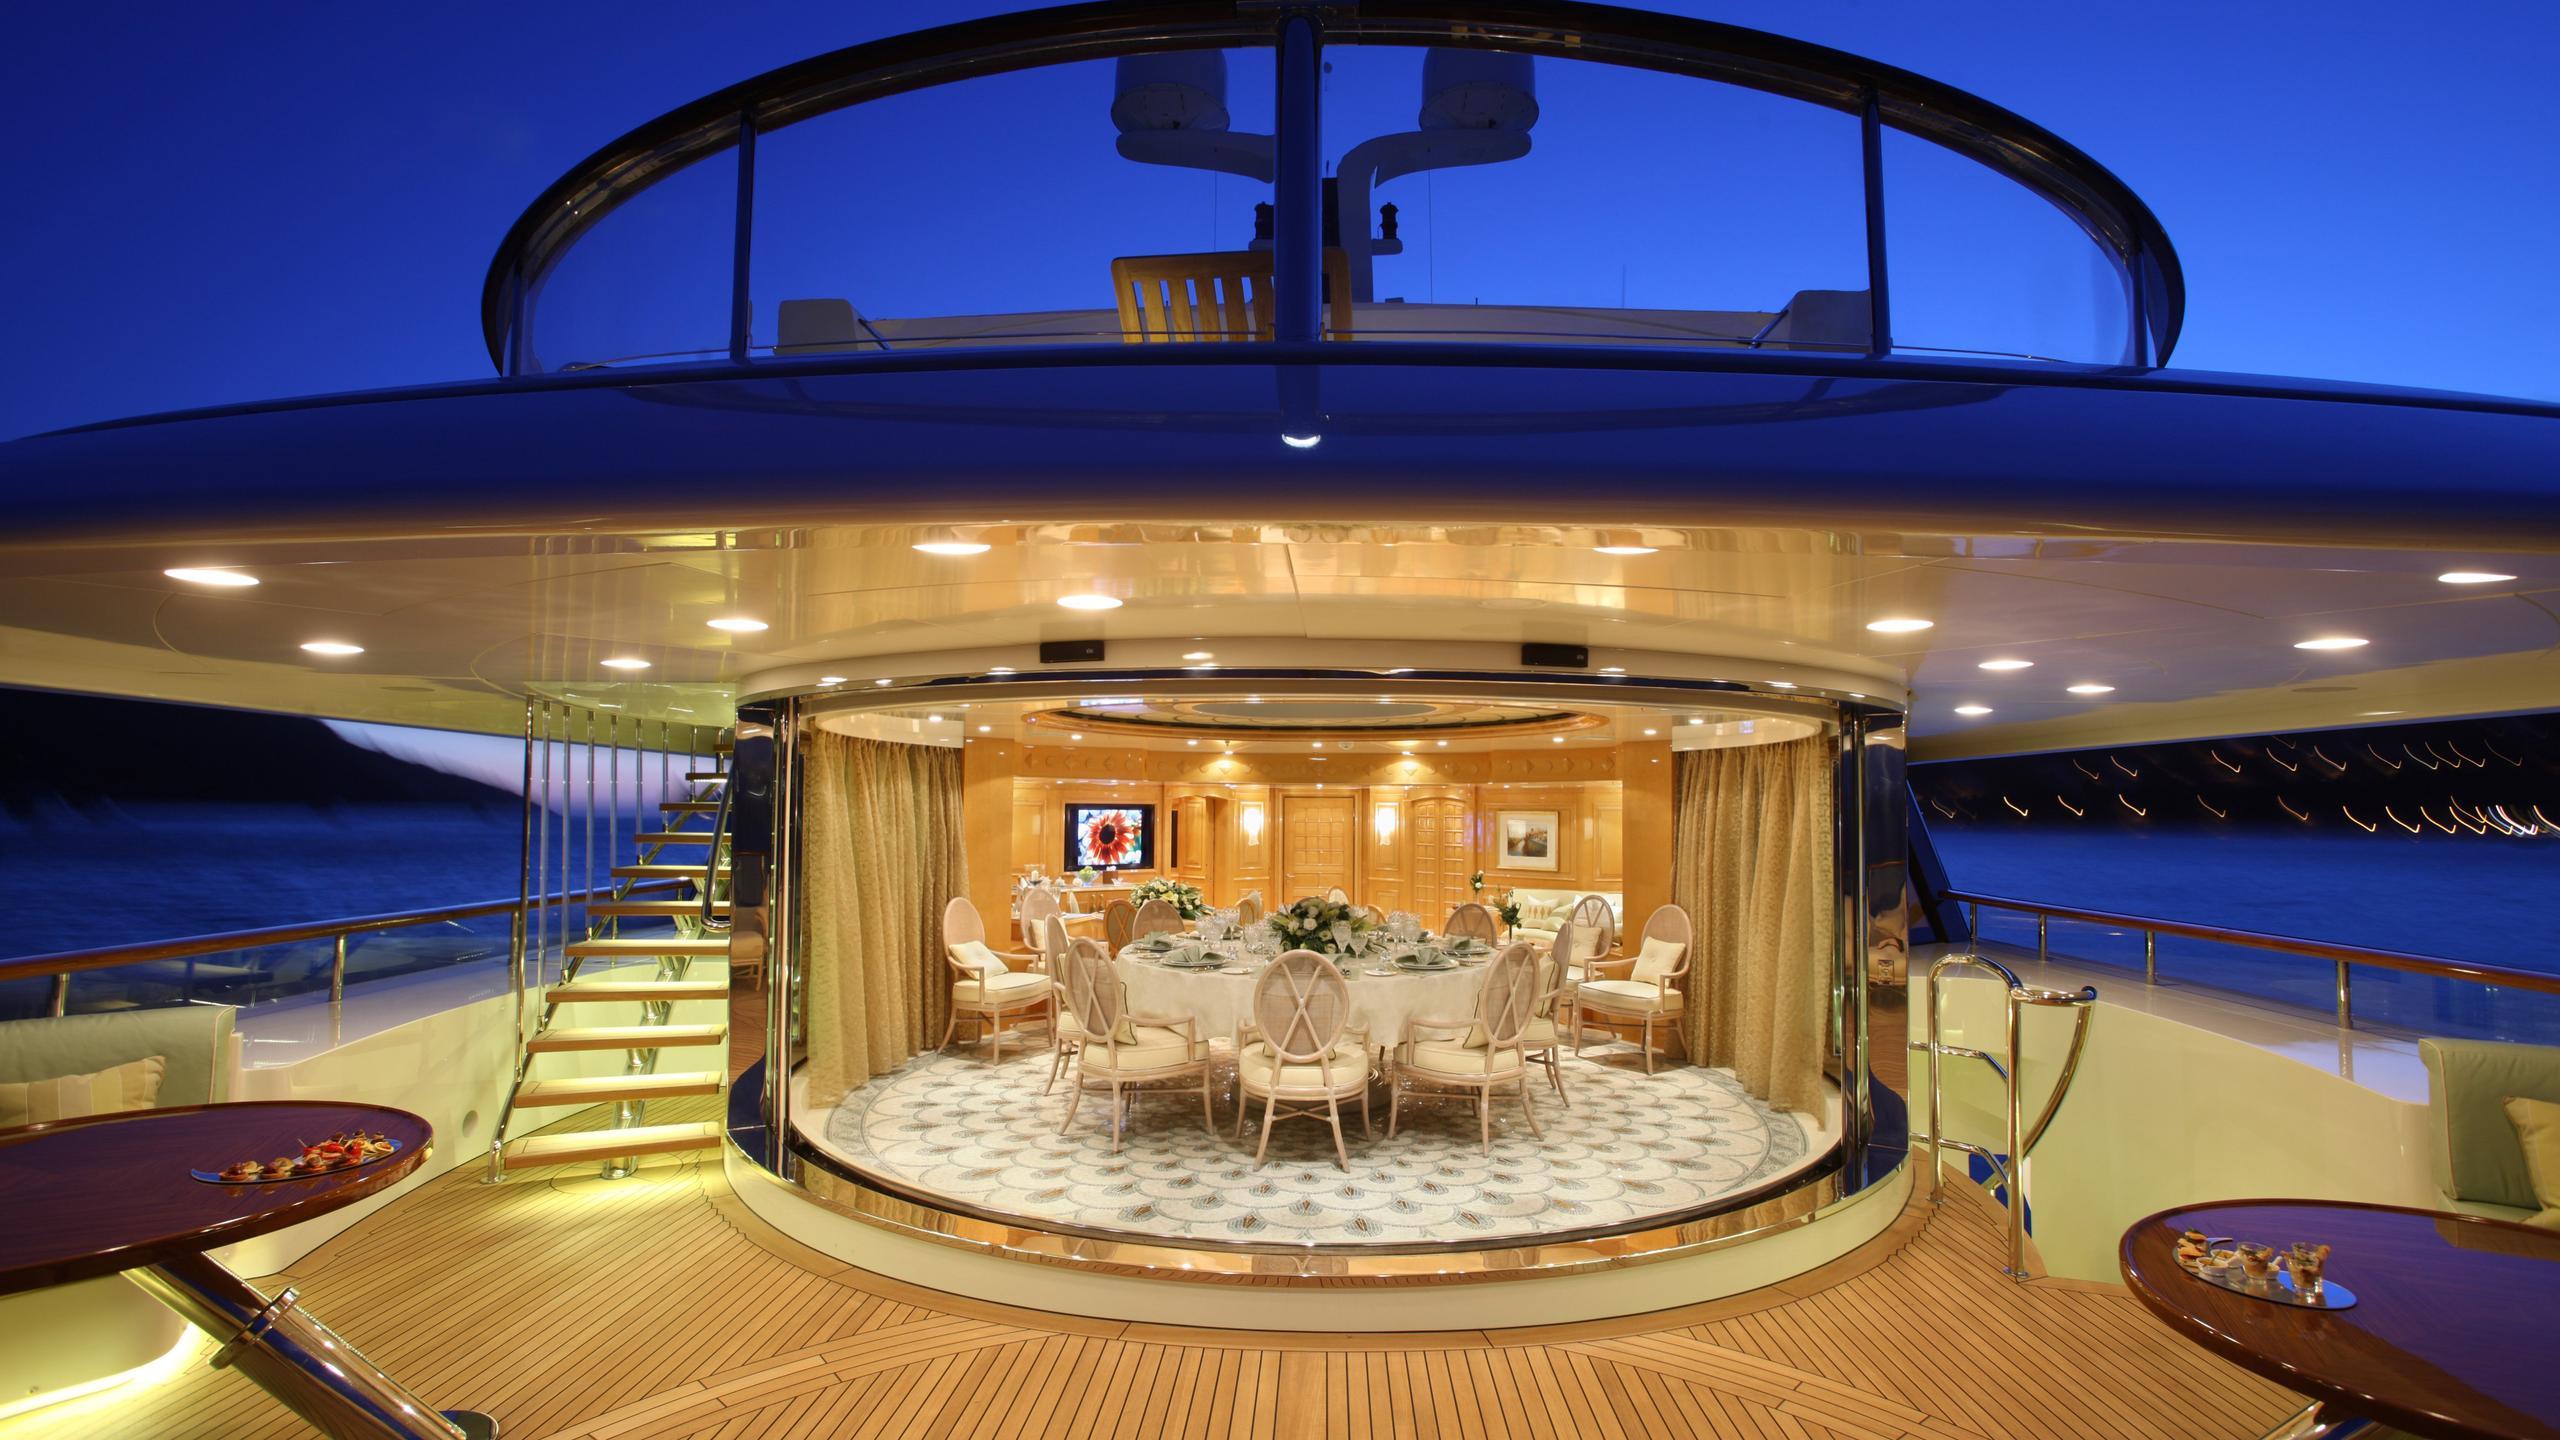 st-david-yacht-upper-deck-dining